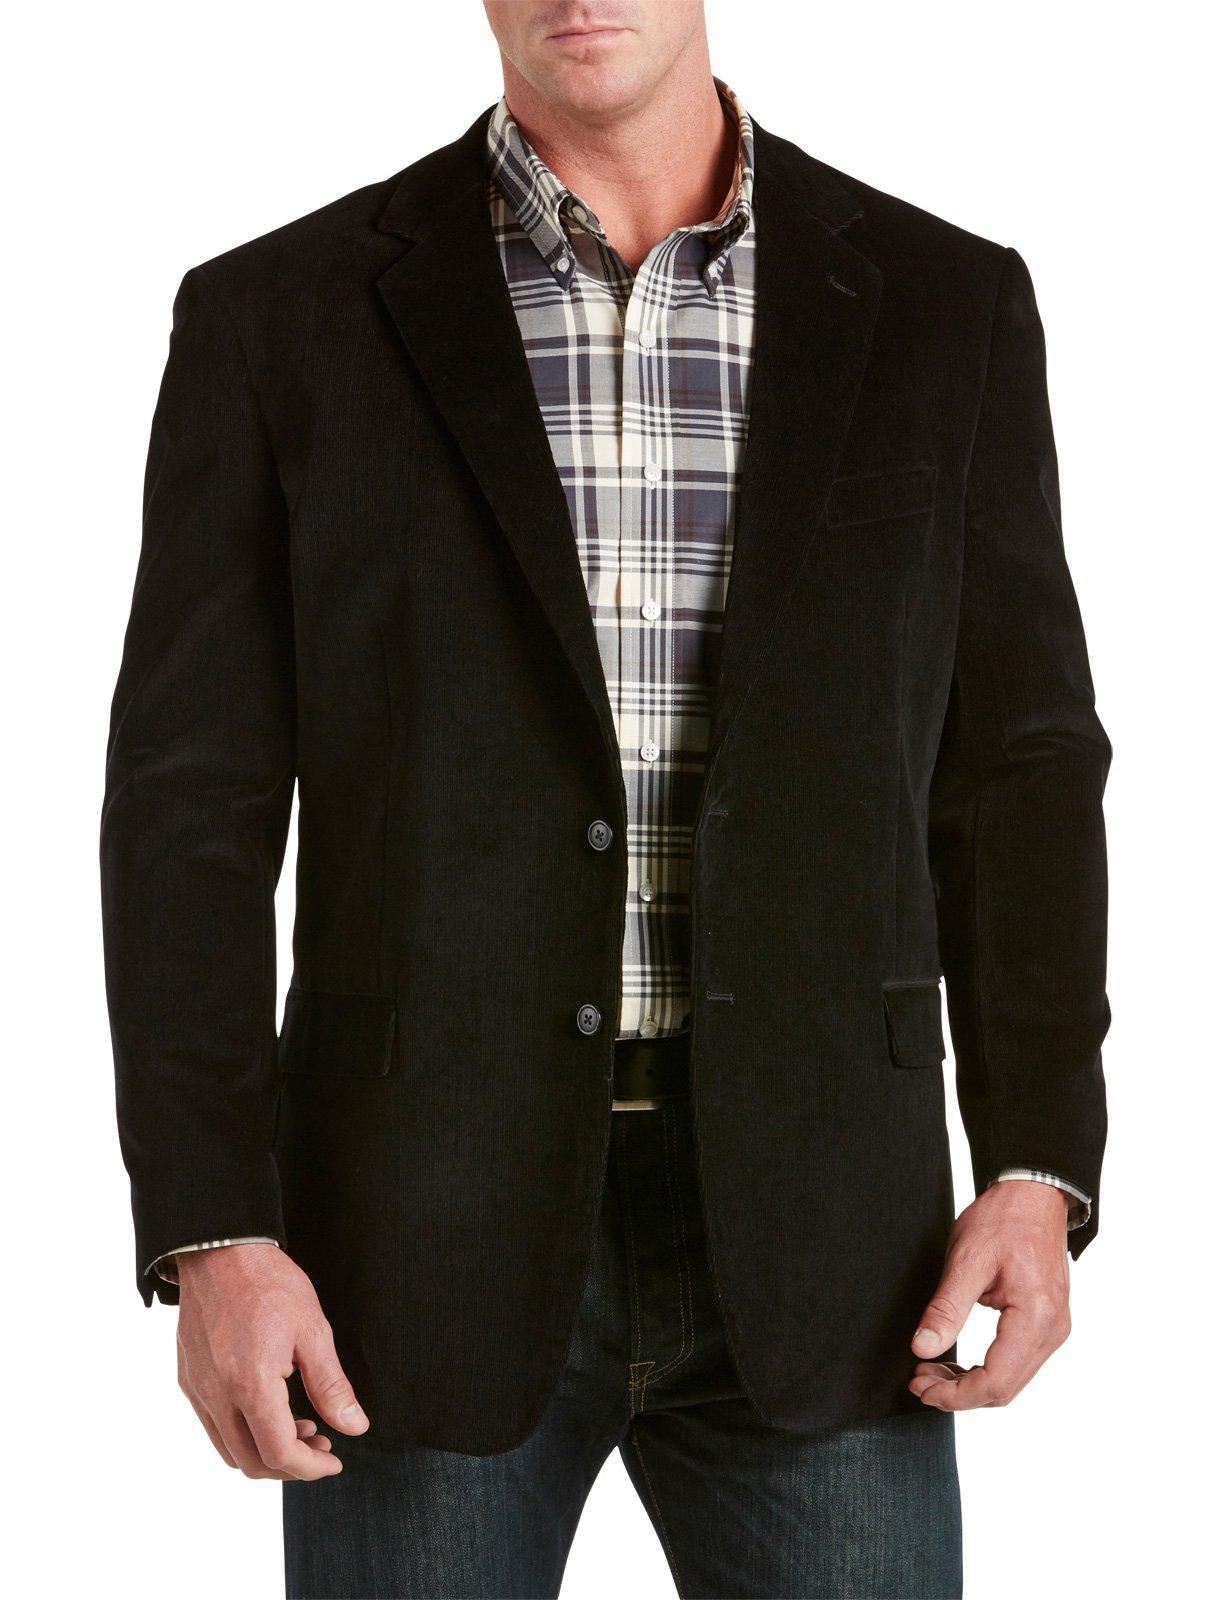 Oak Hill by DXL Big and Tall Corduroy Sport Coat (3XL, Black) by Oak Hill (Image #1)